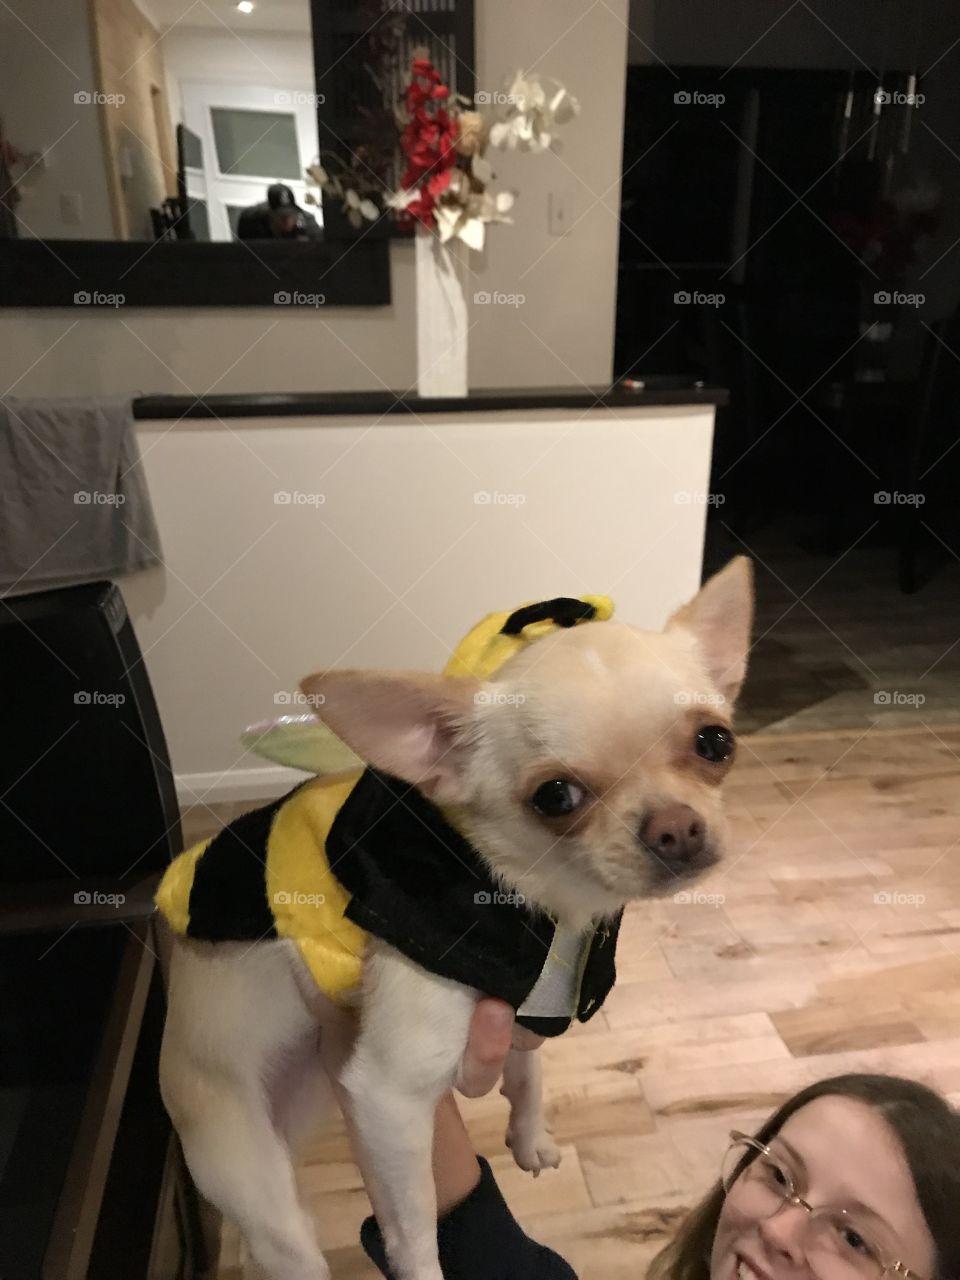 #dog #bee #